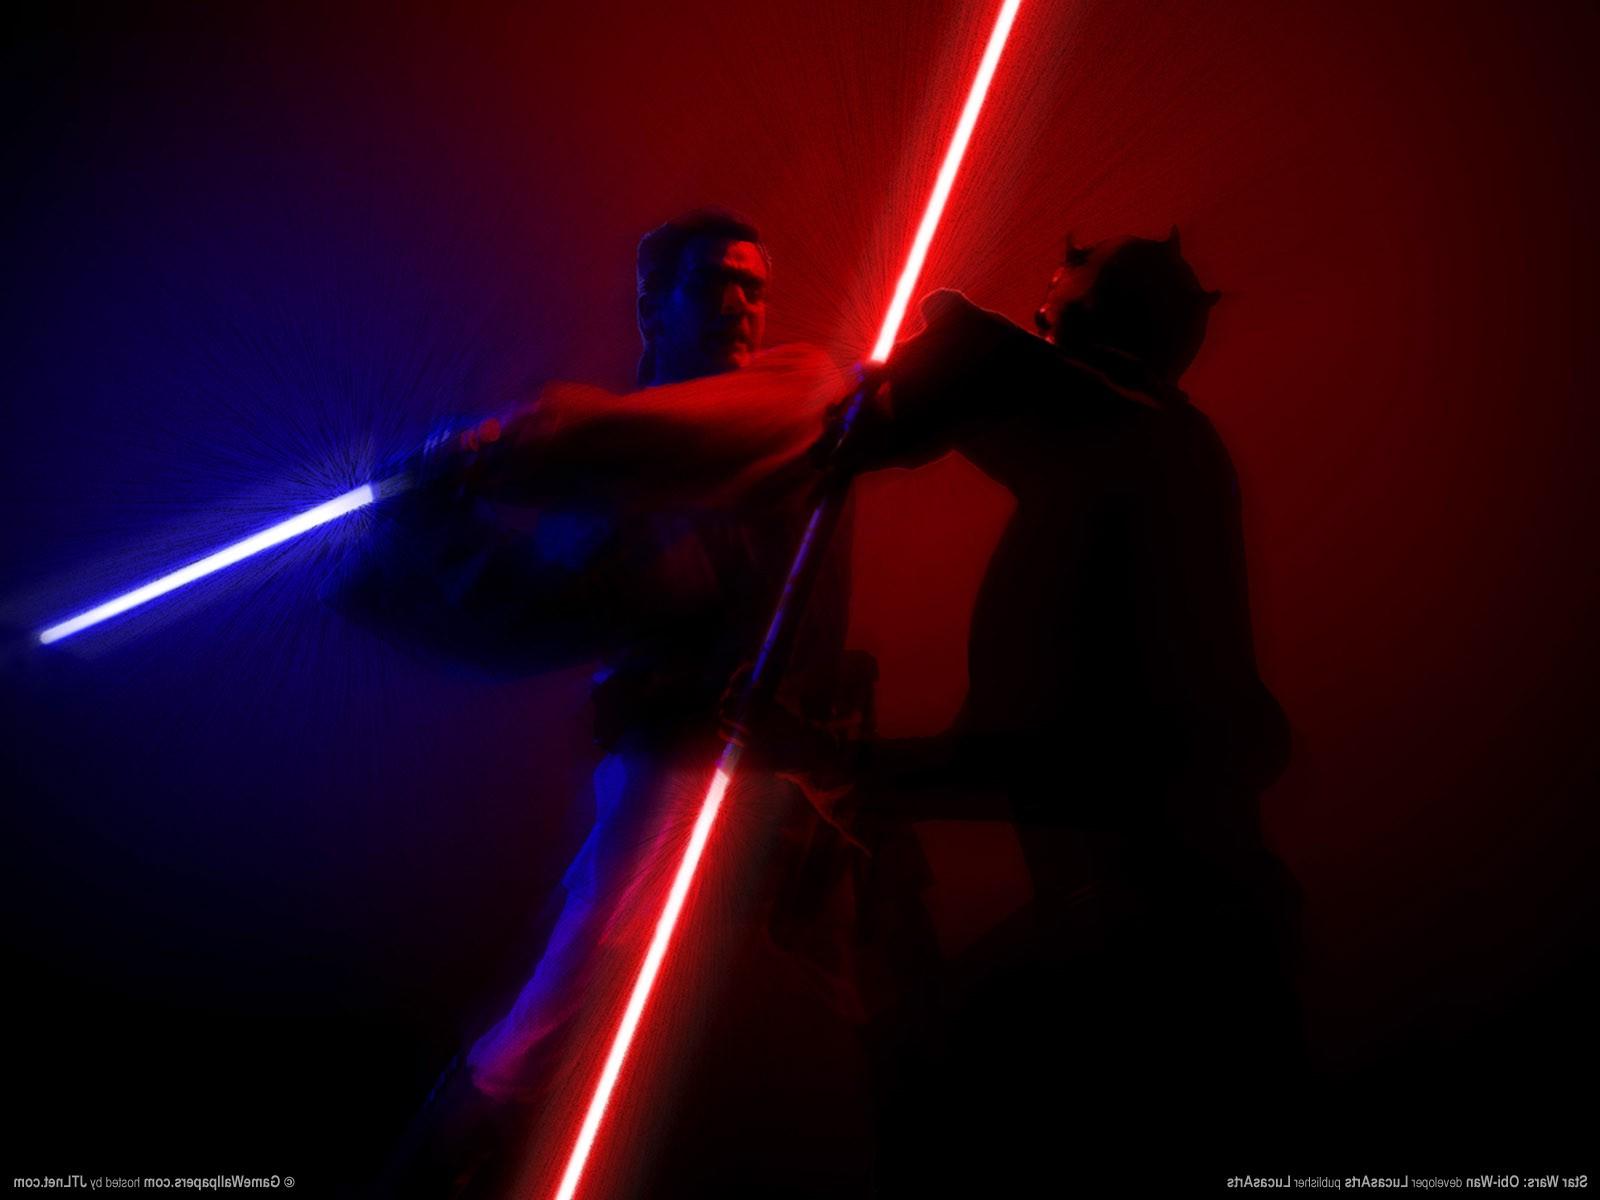 download Star Wars Darth Maul Lightsaber Obi Wan Kenobi 1600x1200